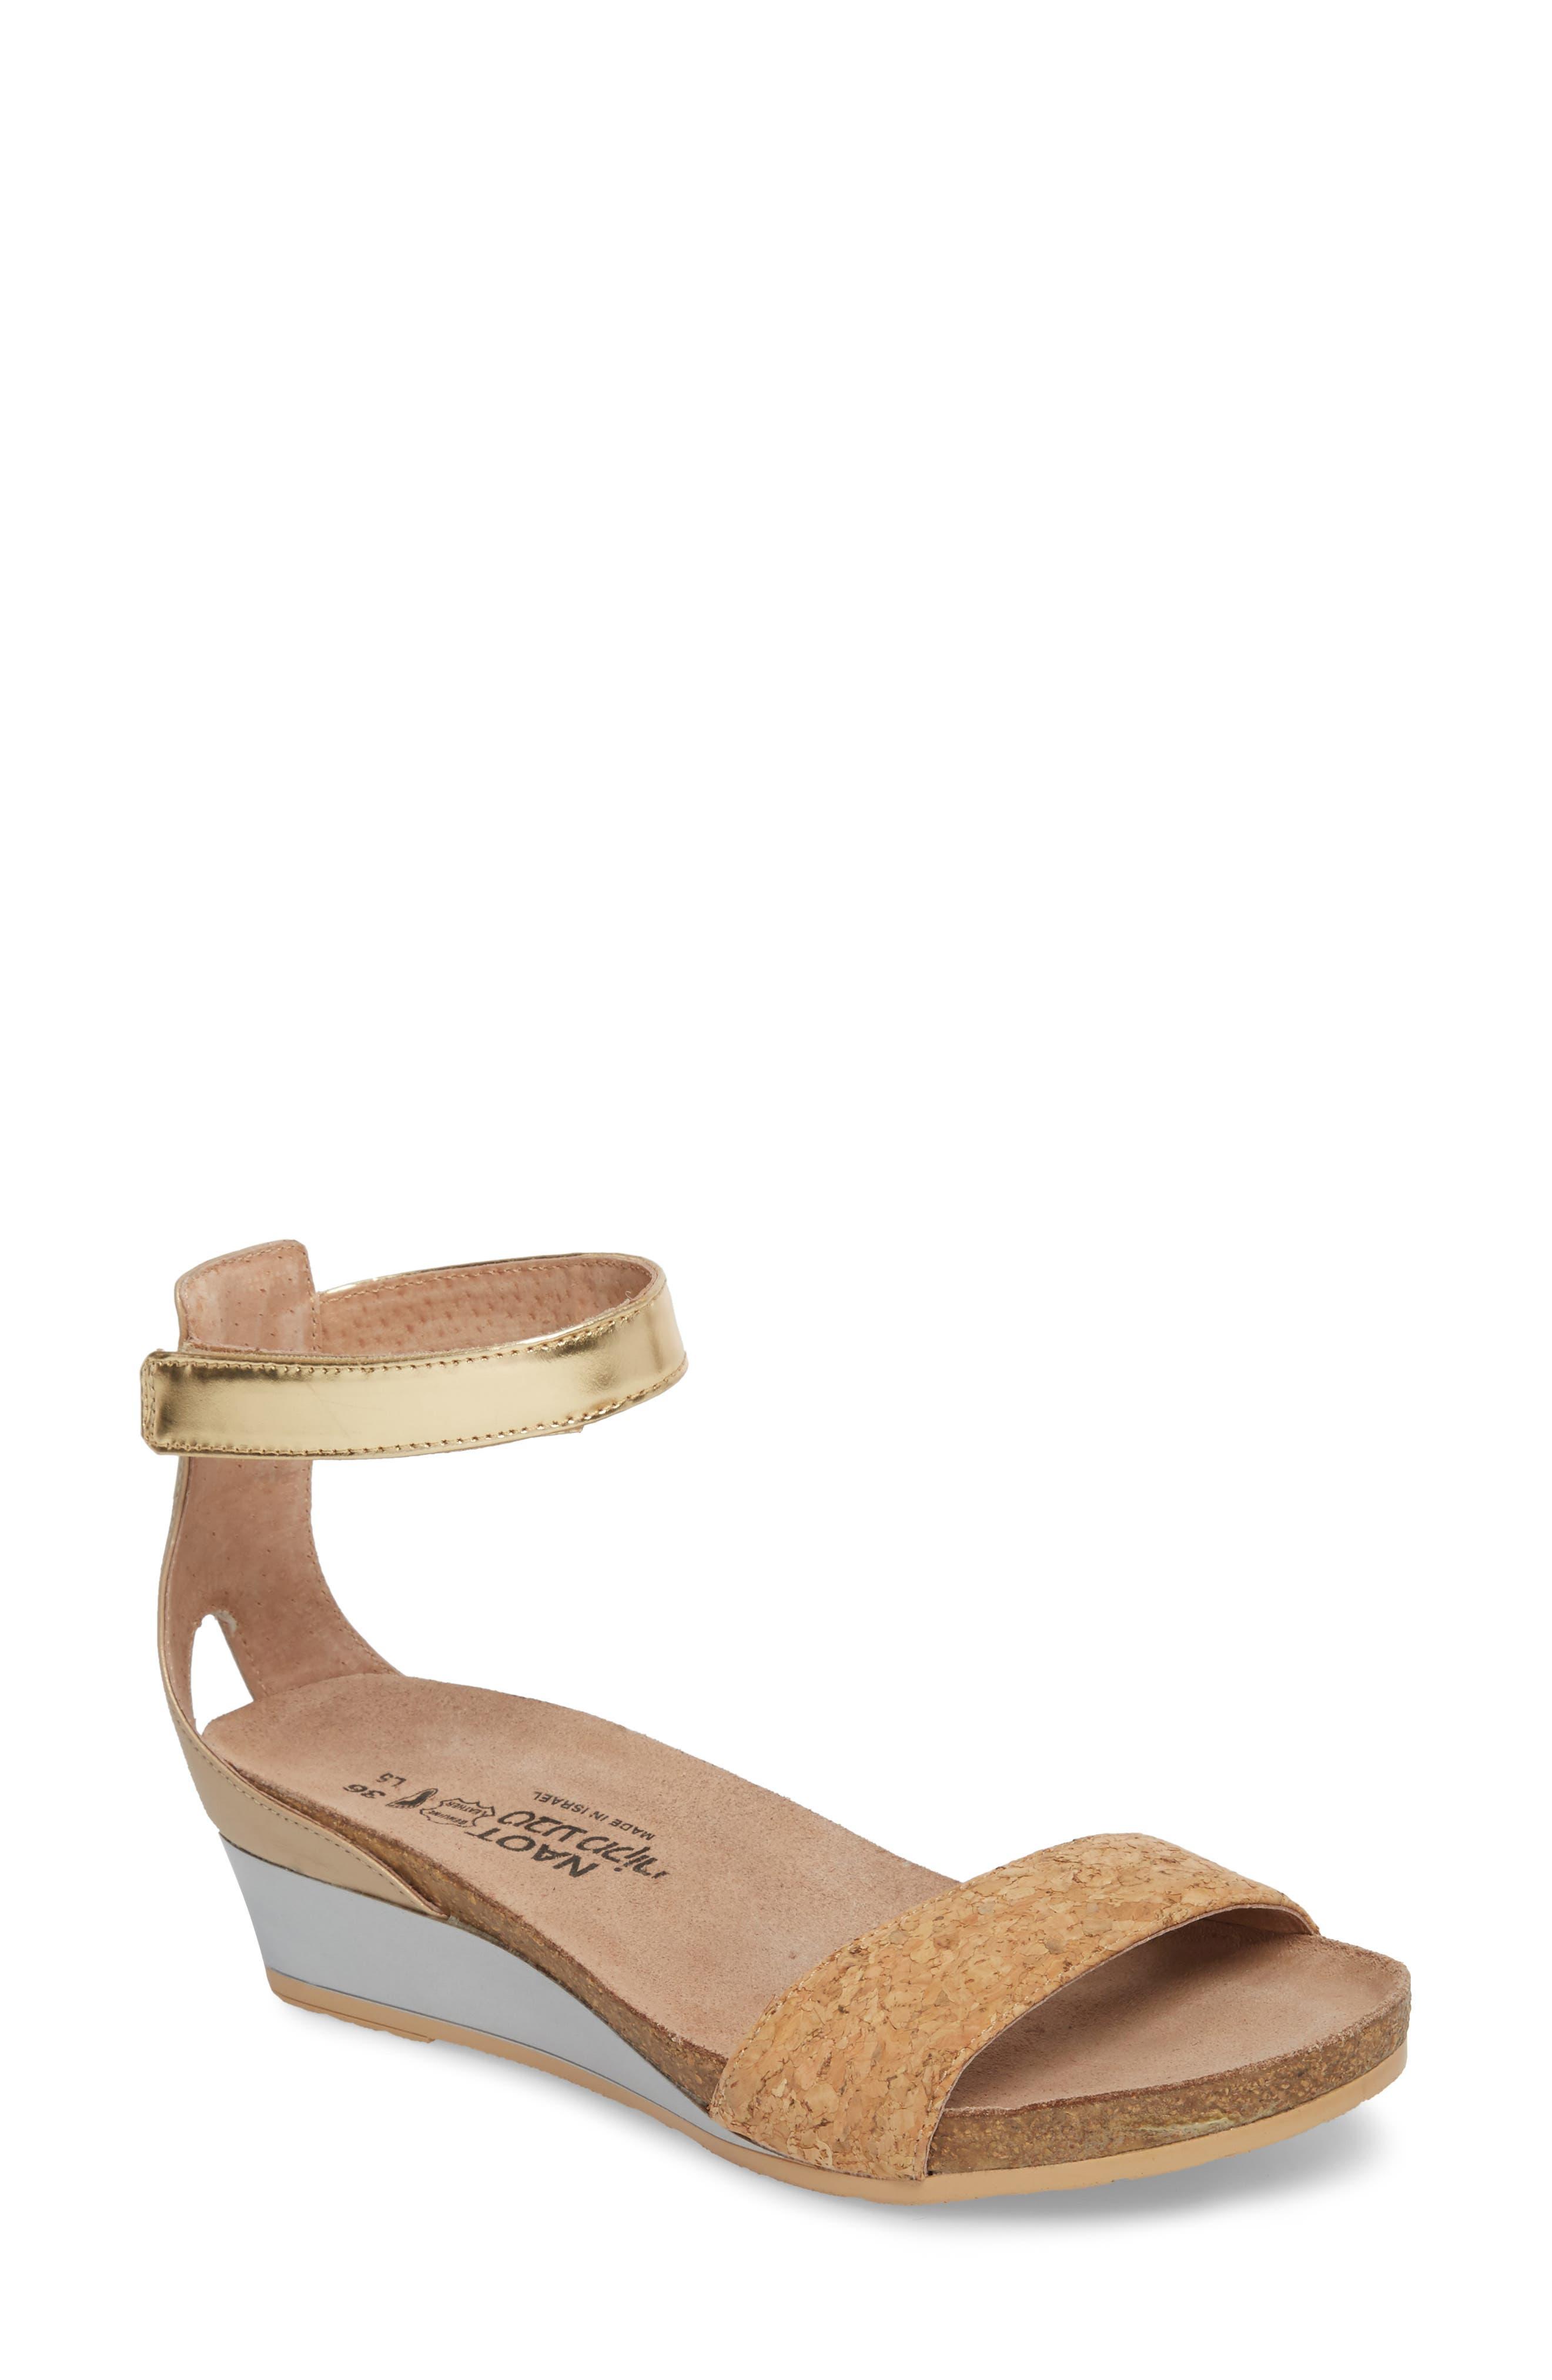 Alternate Image 1 Selected - Naot 'Pixie' Sandal (Women)